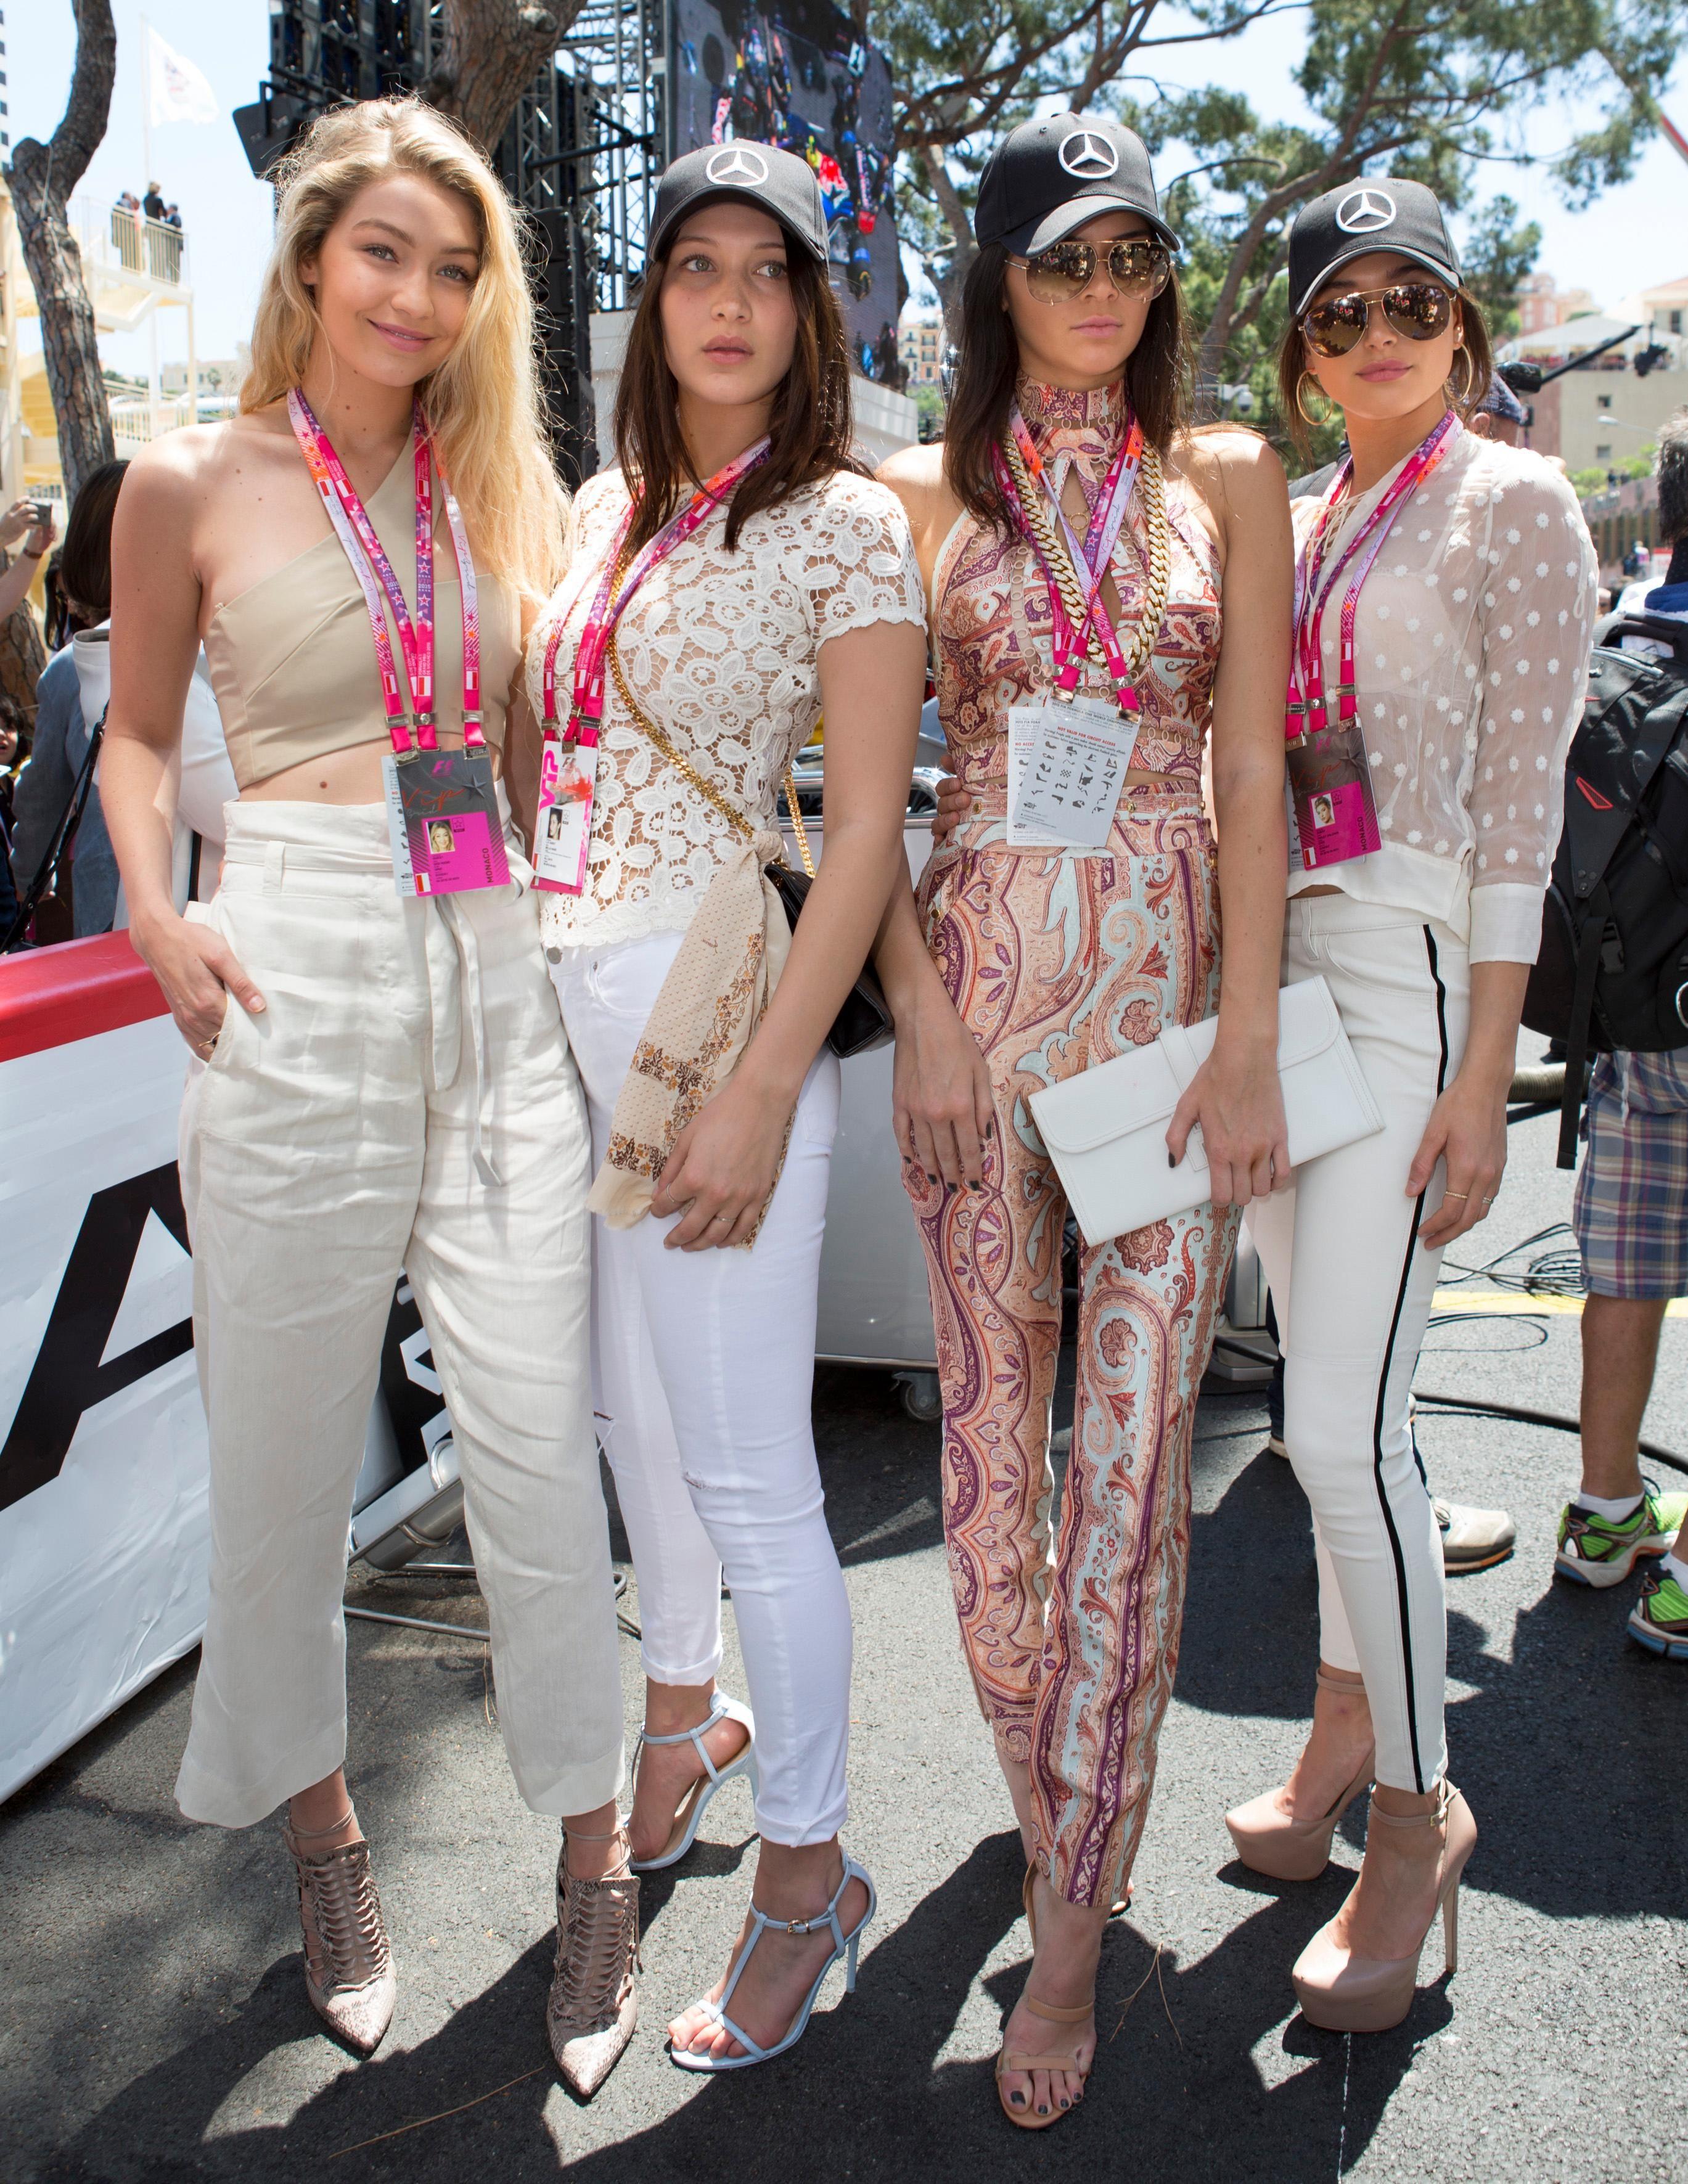 Its Happening: Bella and Kendall Are Bringing Back the Thong Bikini